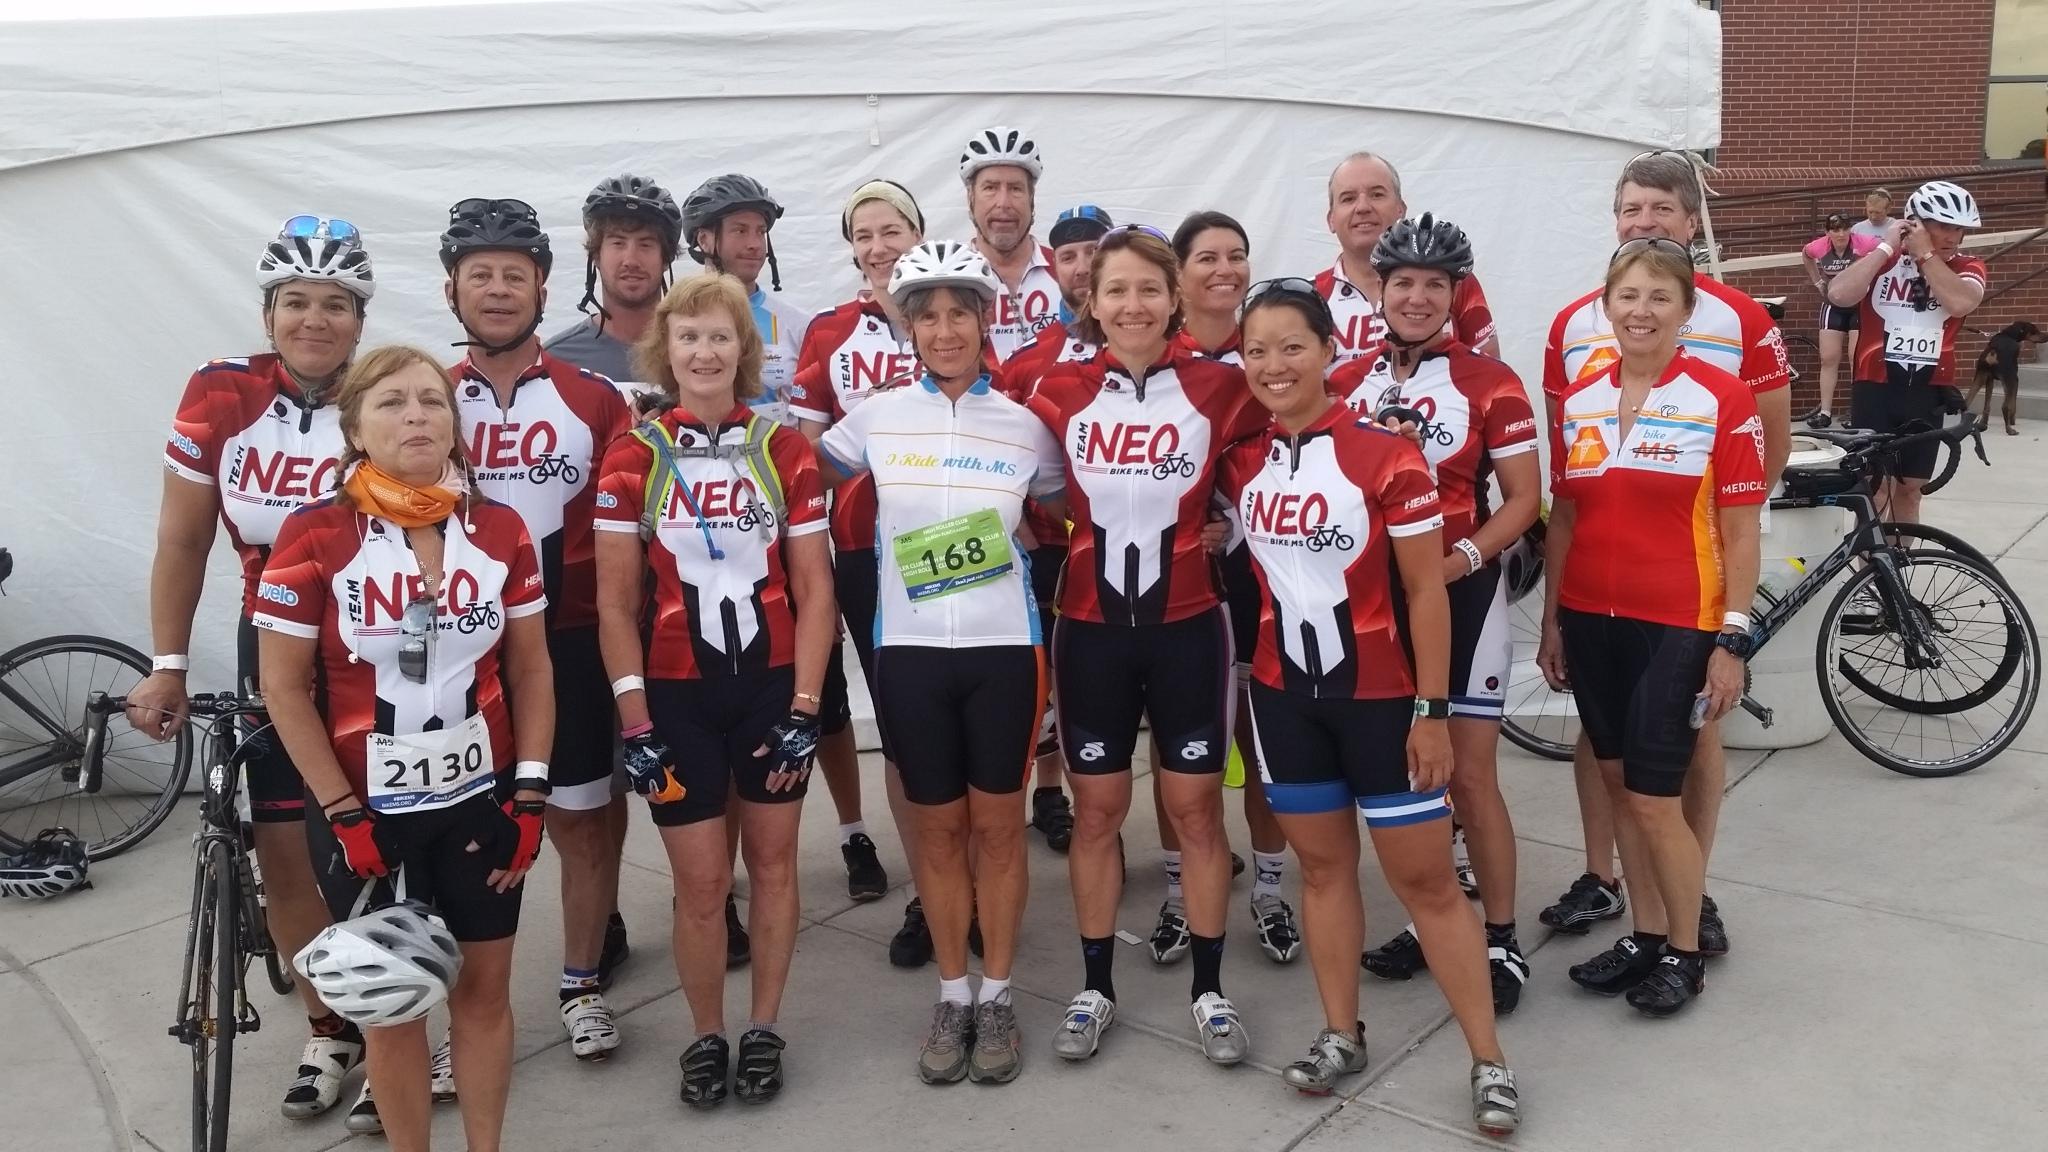 Team NEO Bike MS group photo, 2016 event